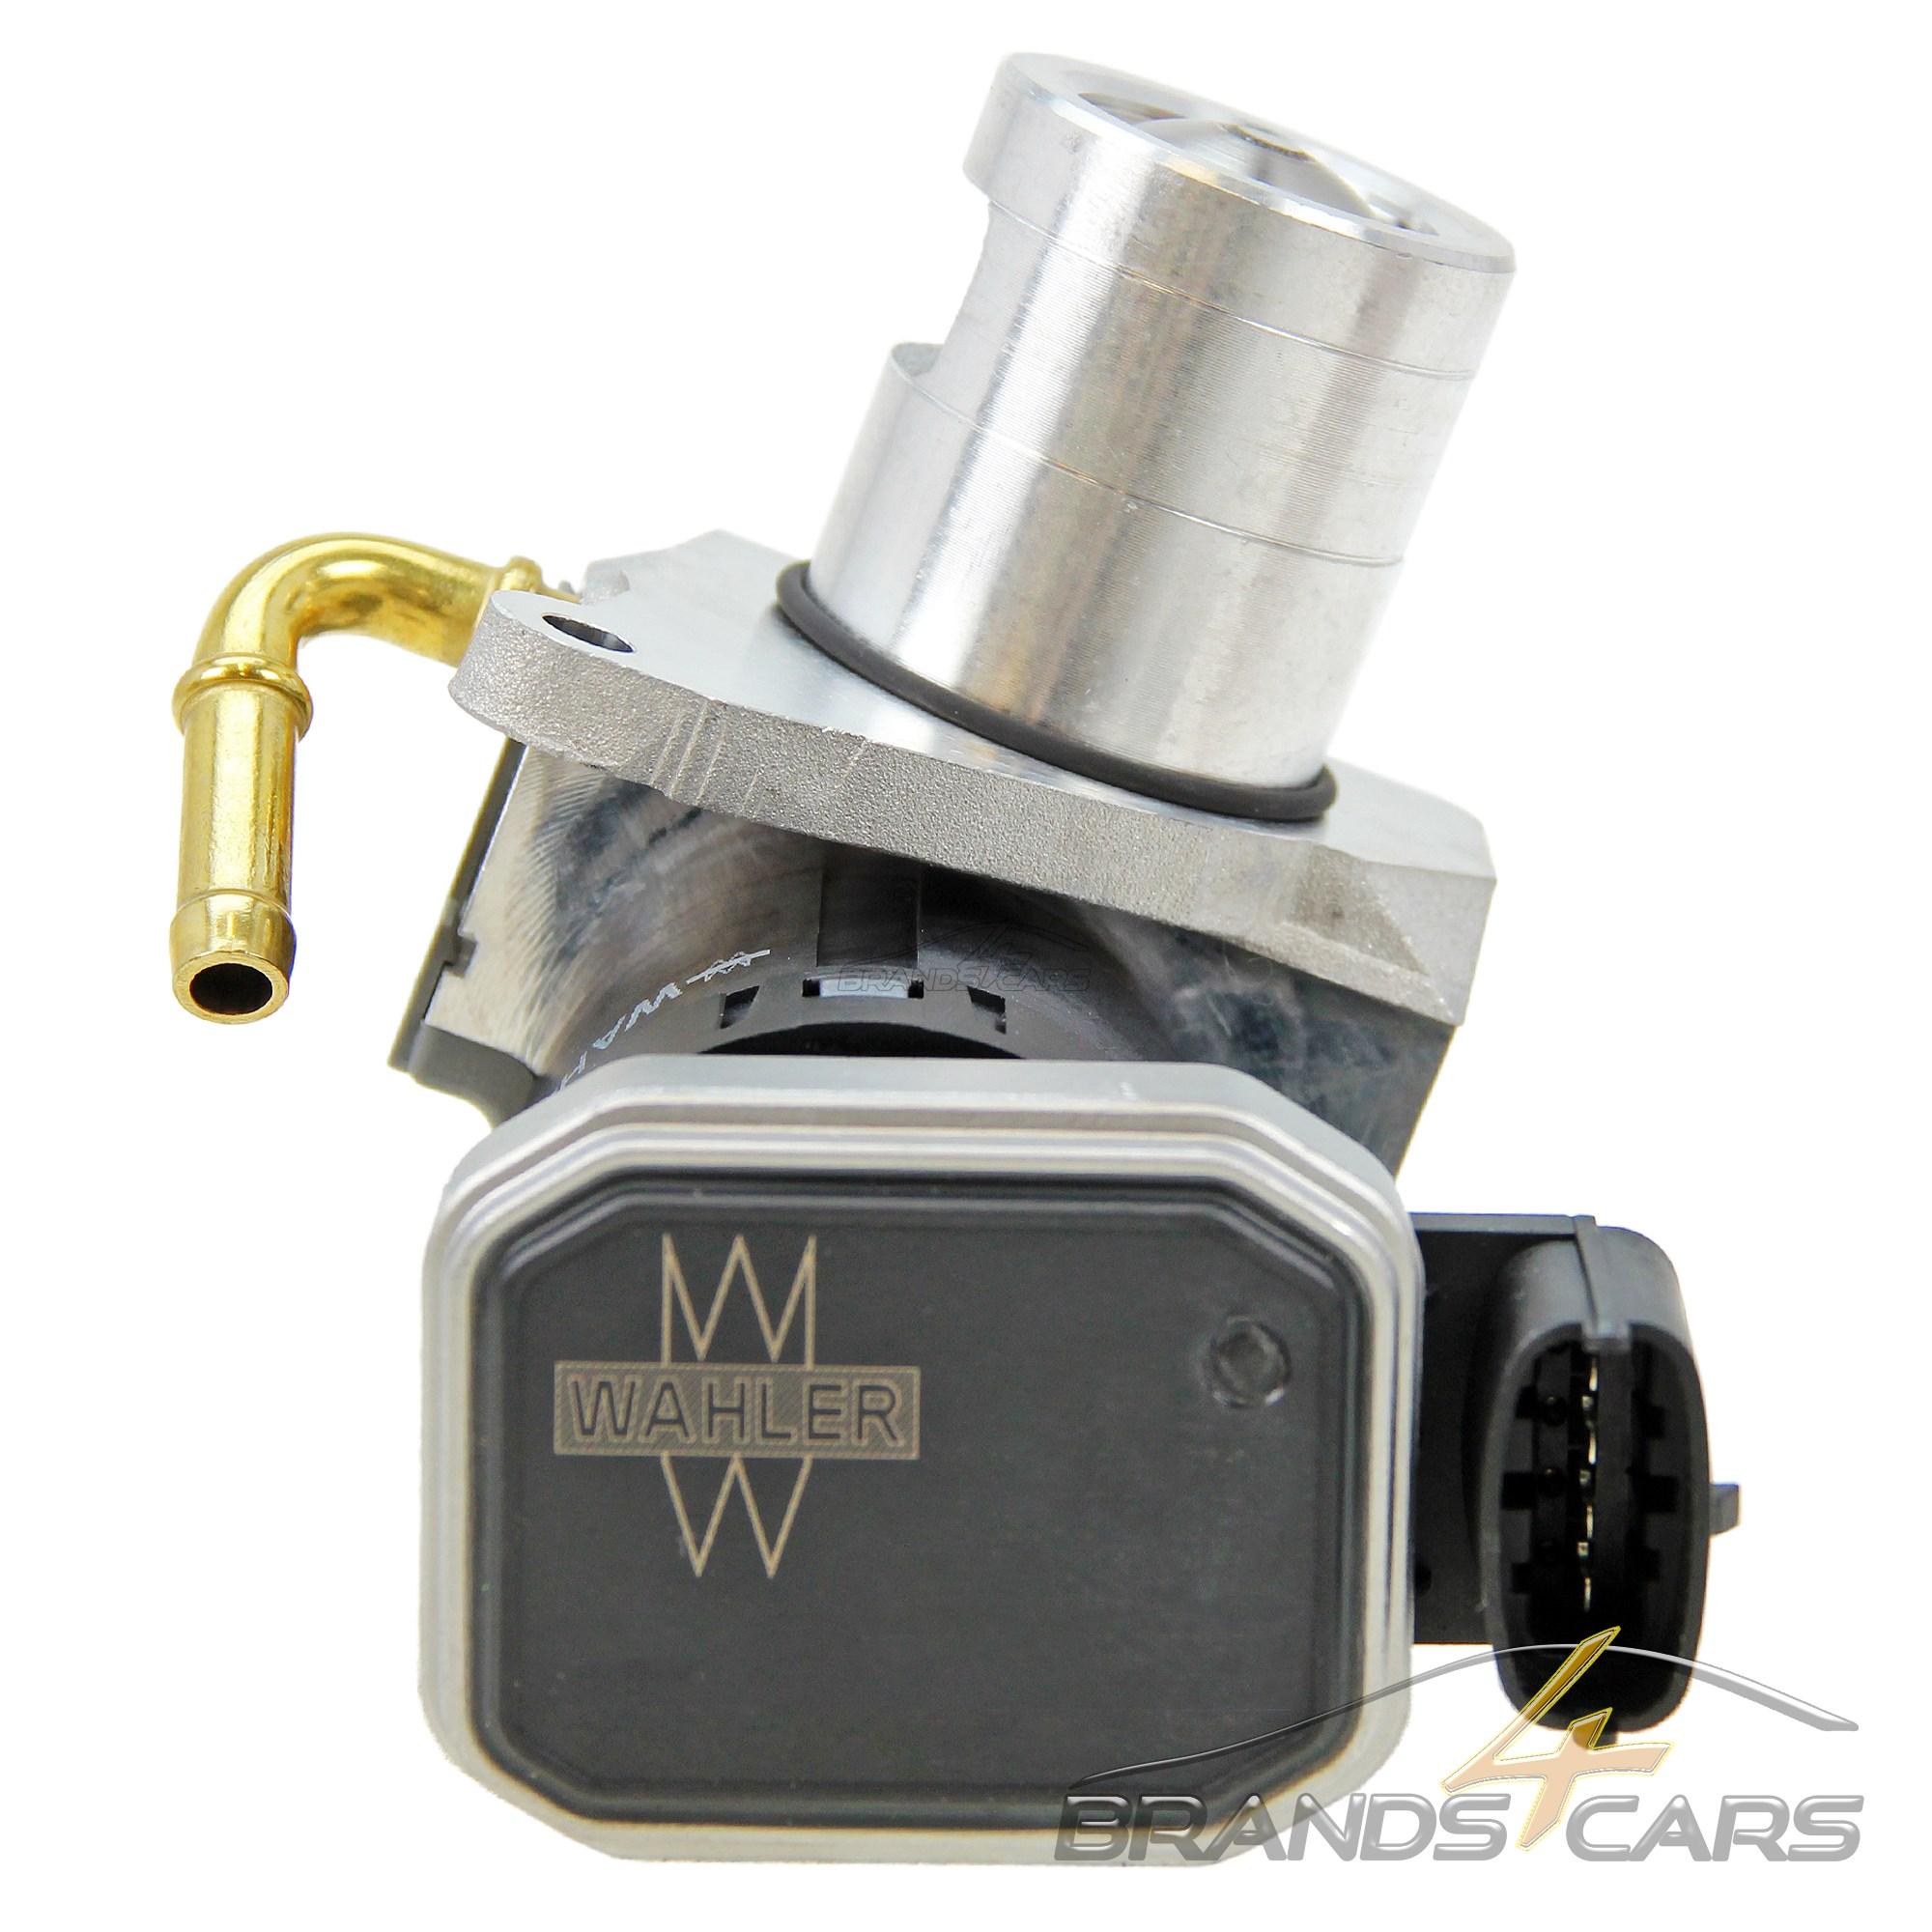 Original Audi Antennenfuss Antenne Radio Telefon A6 Avant 4B 4B9035501J